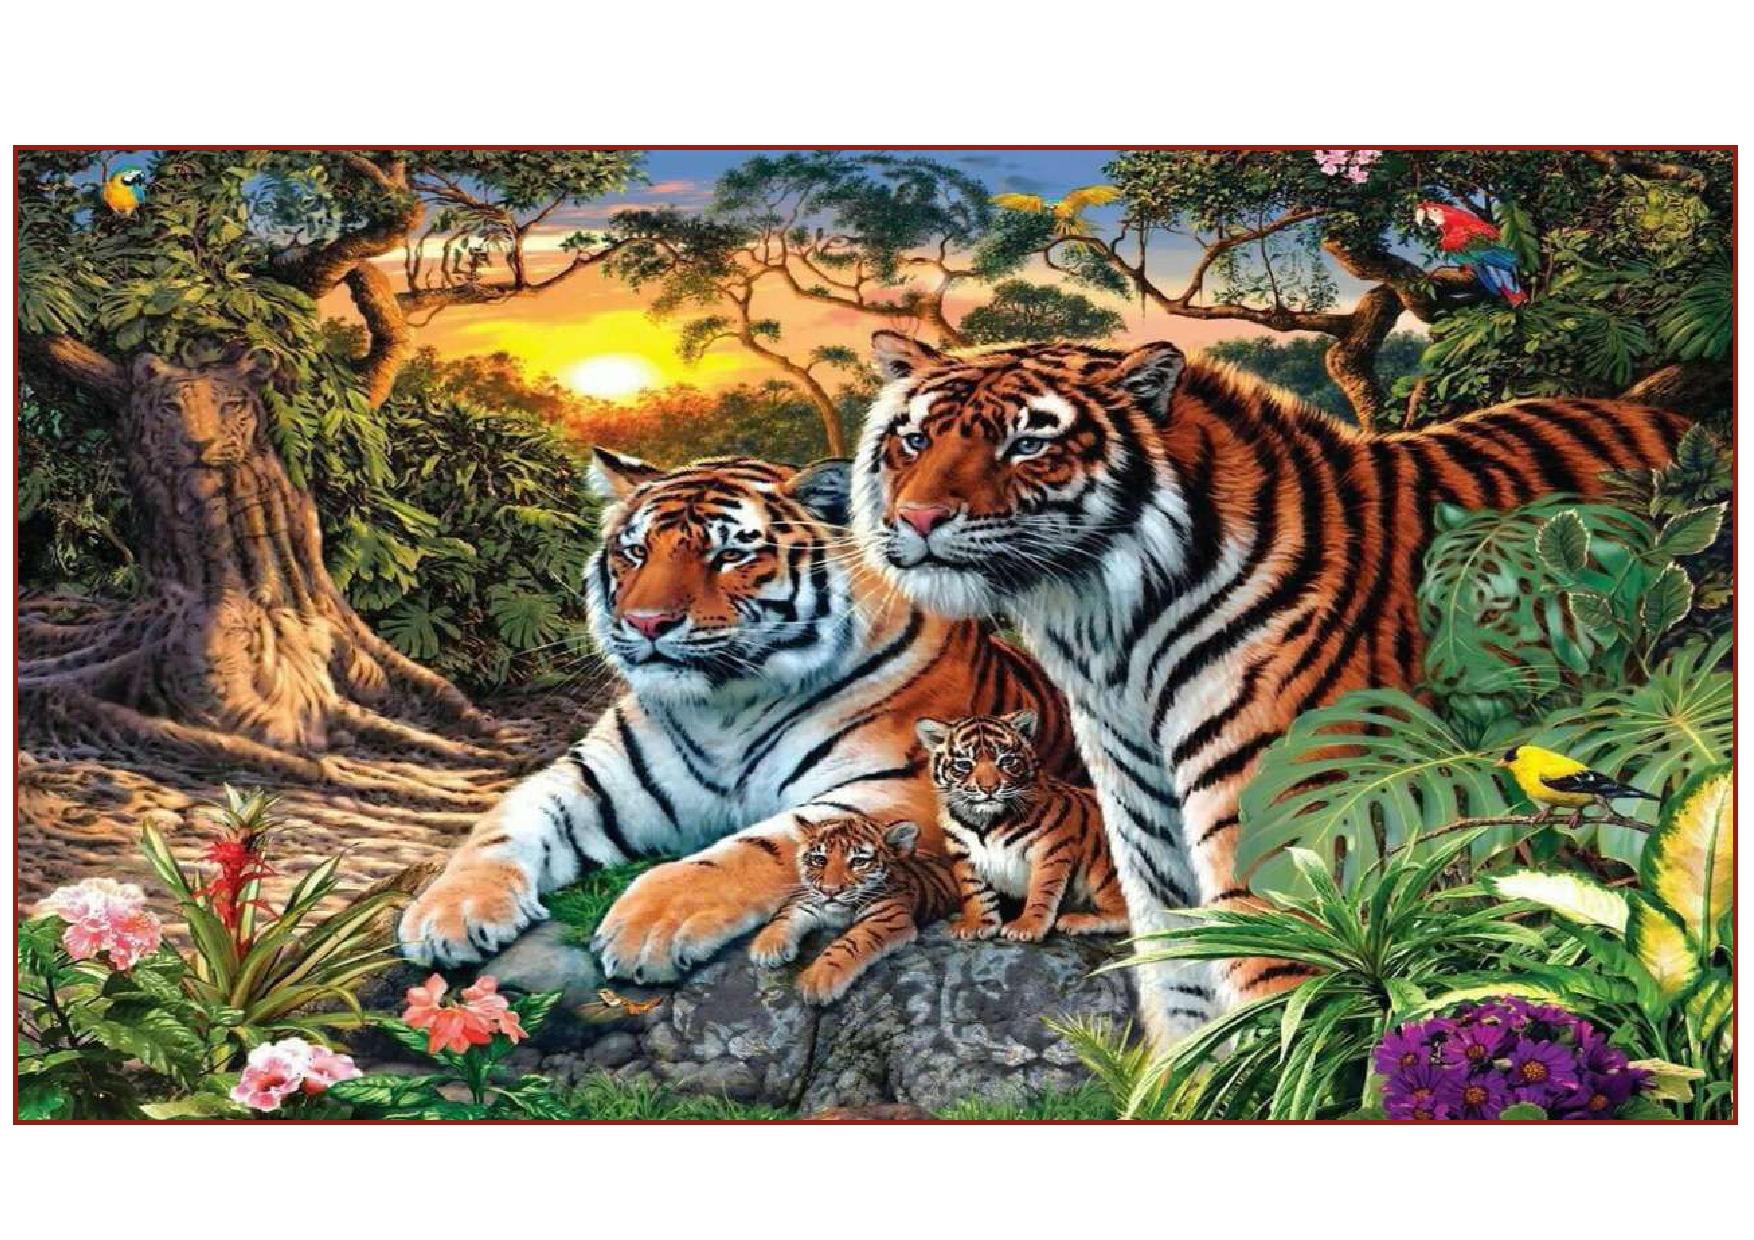 tigre-page0001.jpg